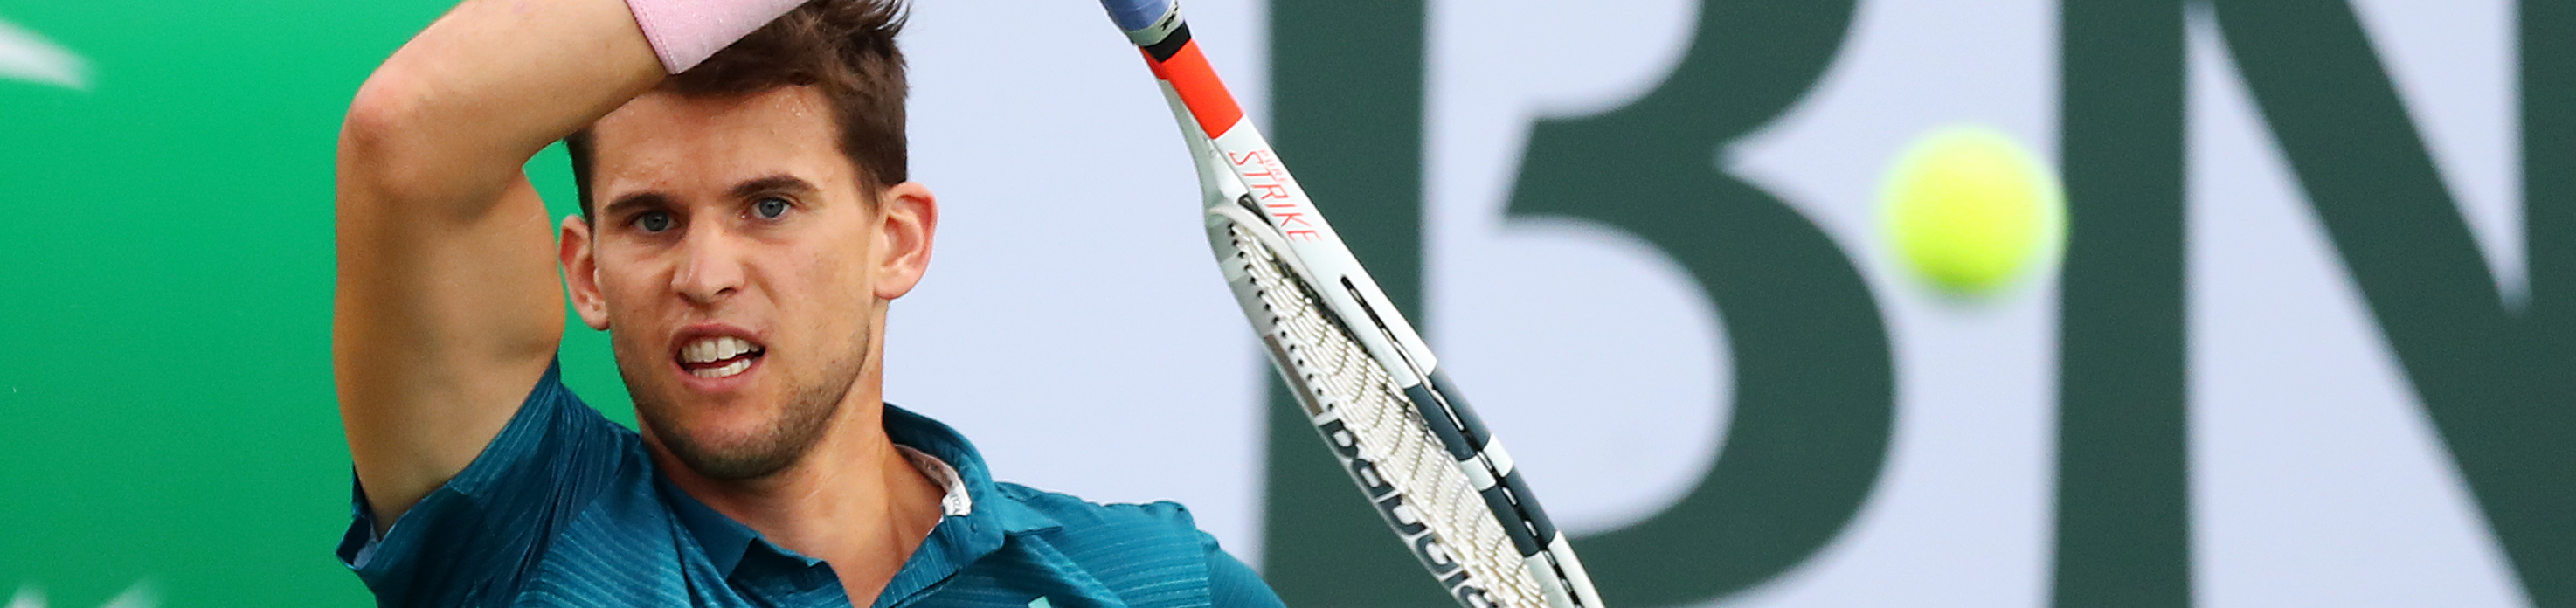 ATP Montecarlo, due consigli per mercoledì 17 aprile